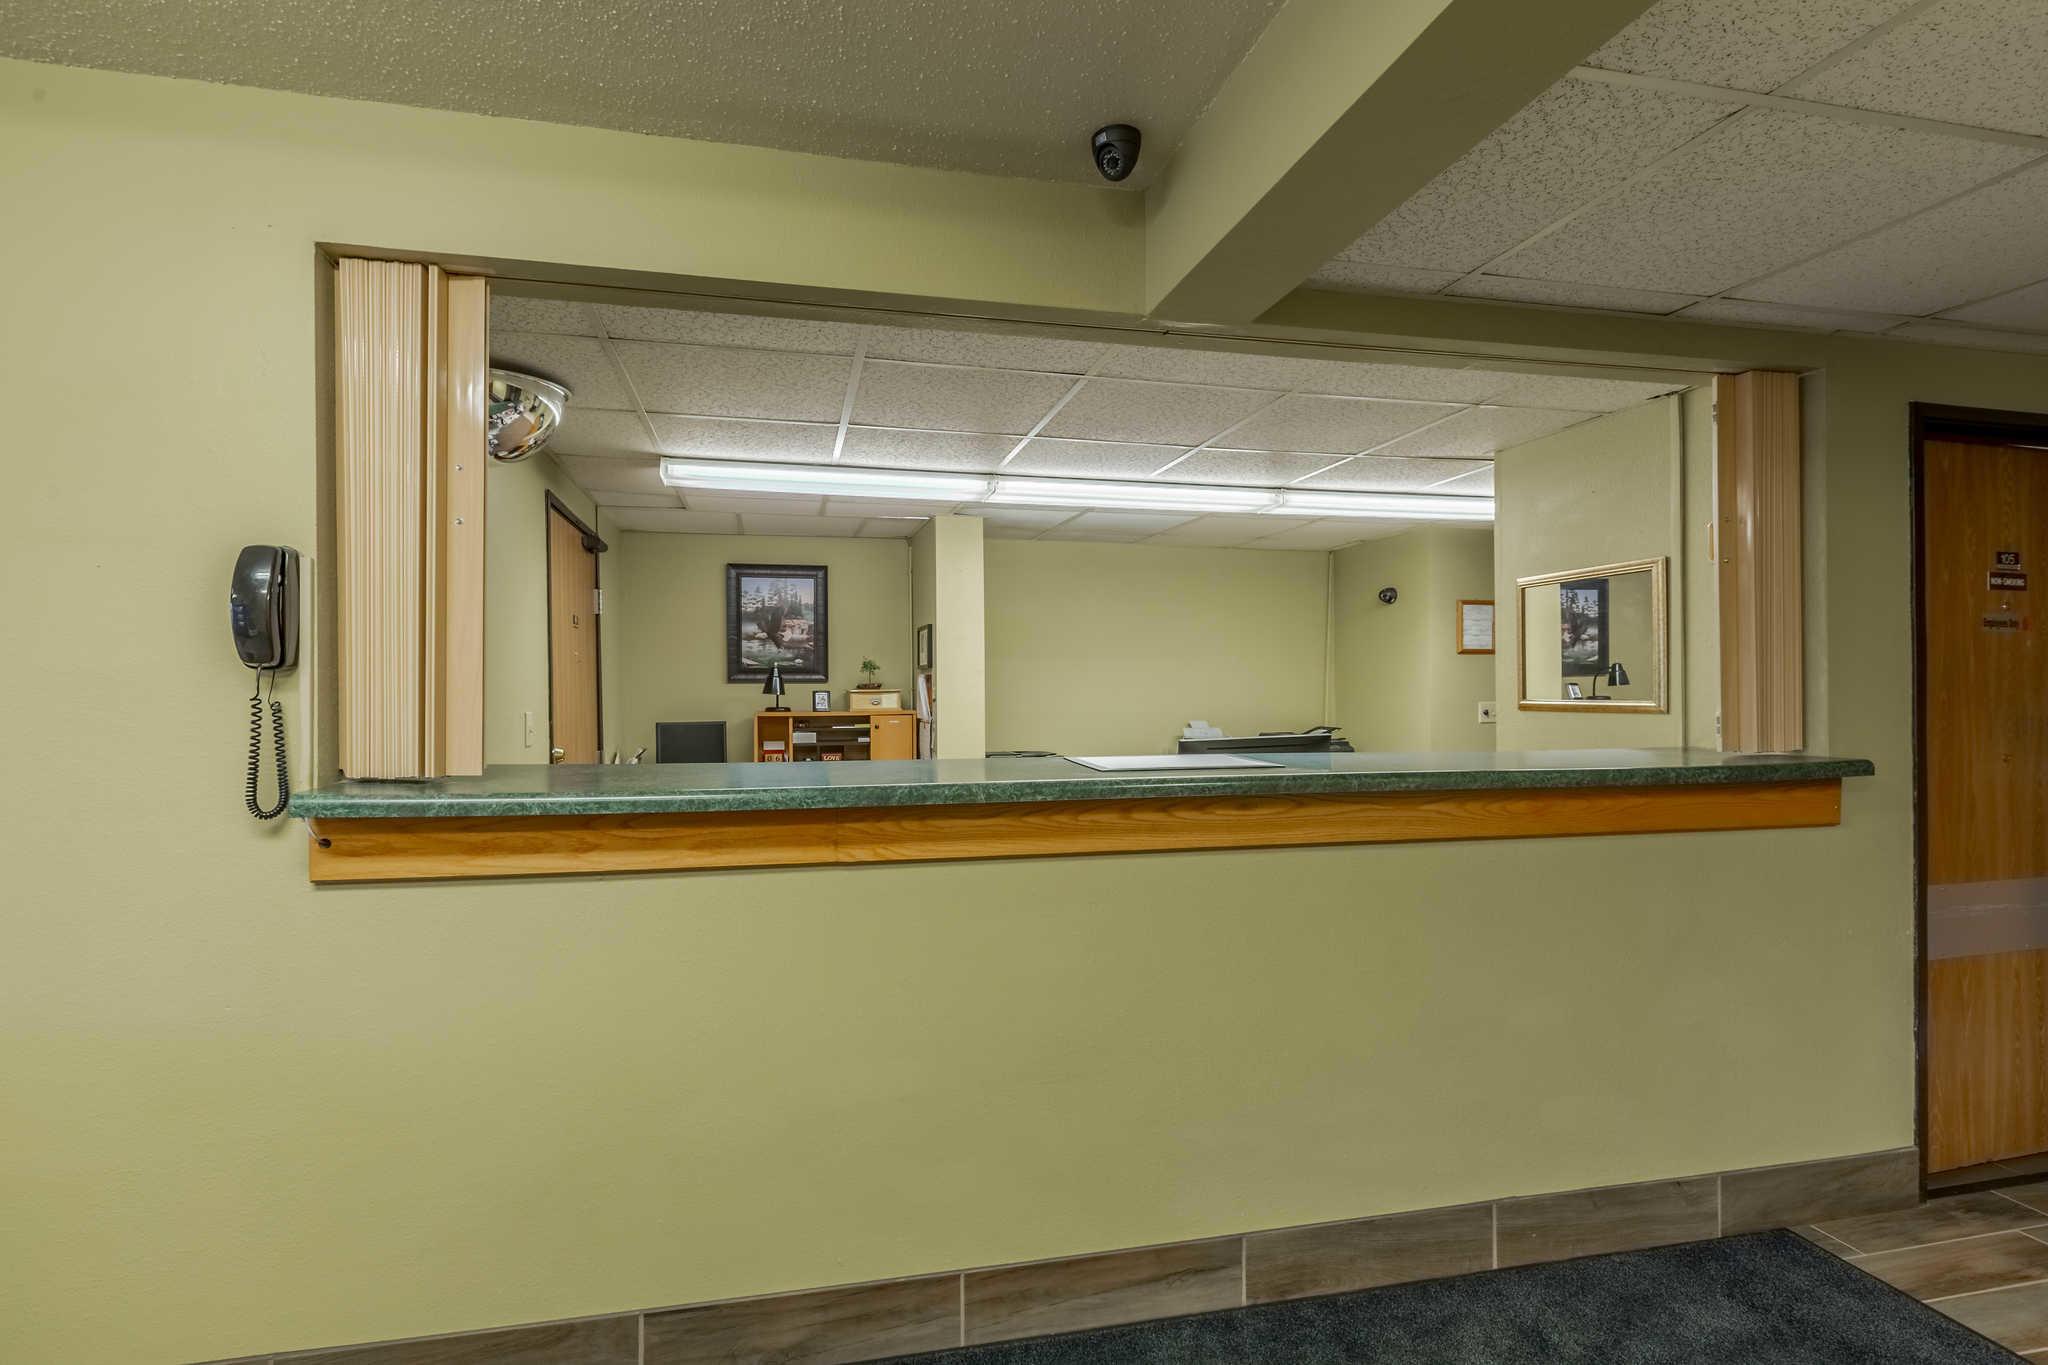 Rodeway Inn image 6